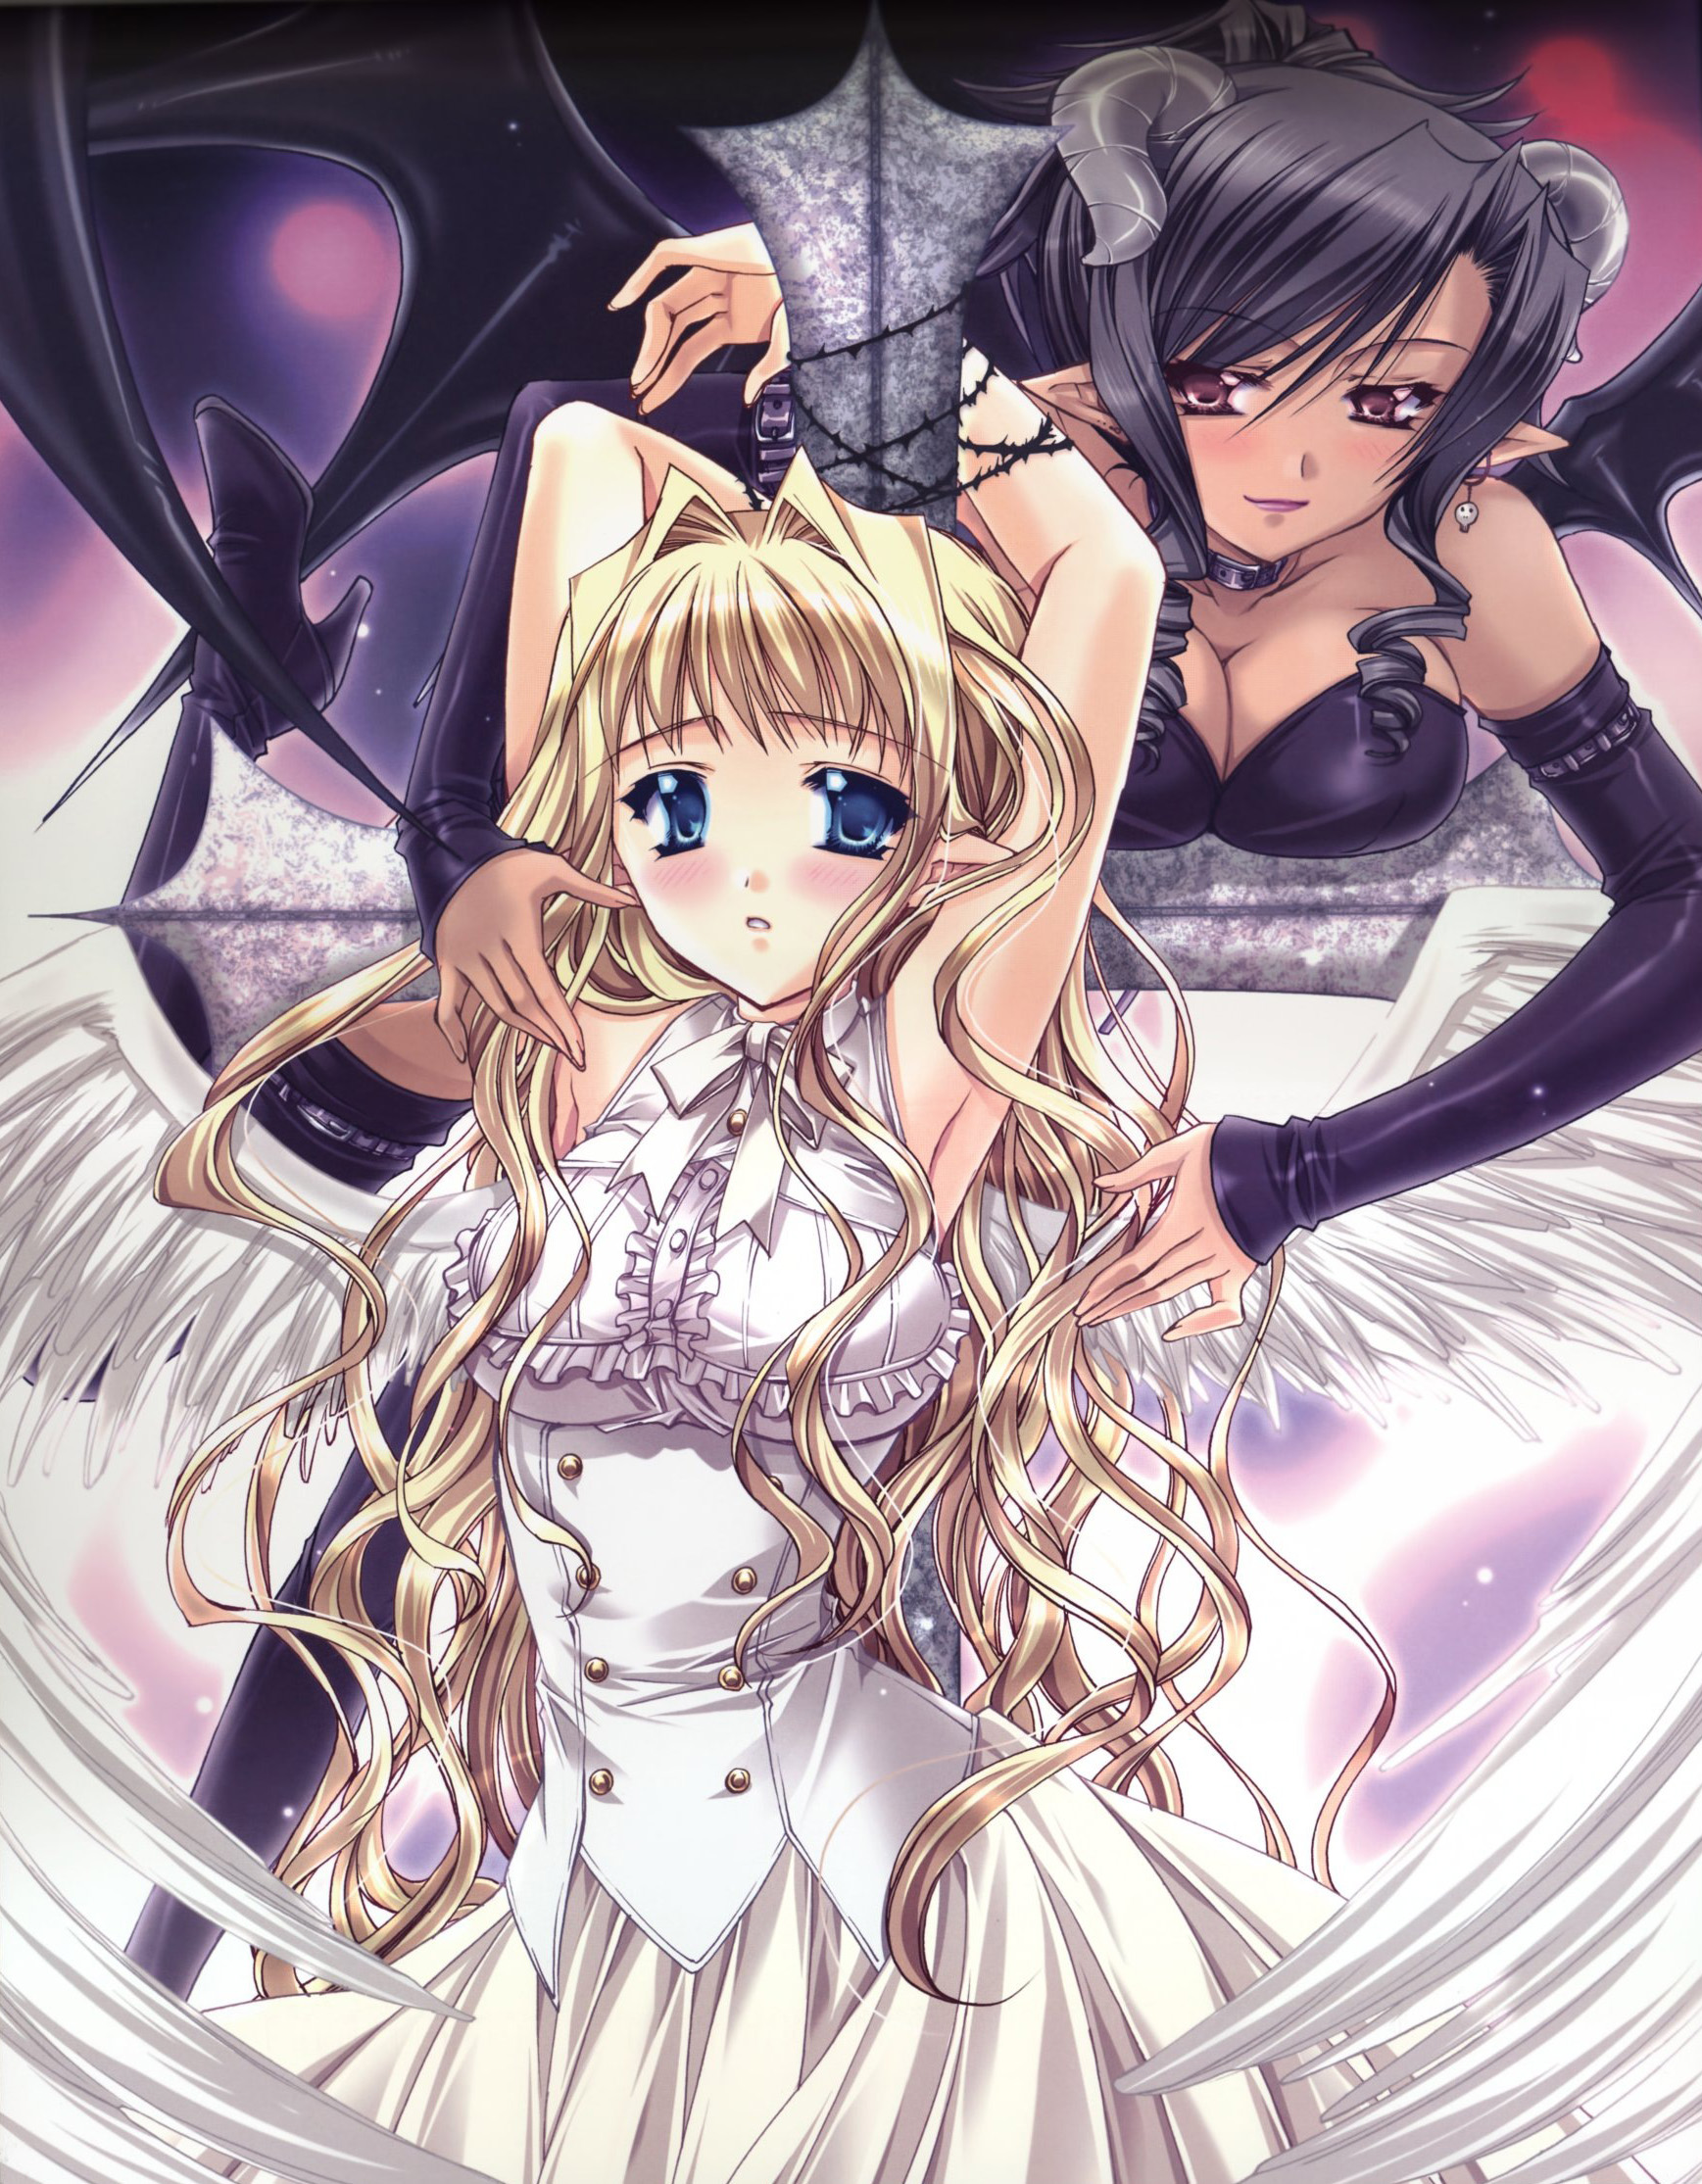 Safebooru - angel angel and devil armpits barbed wire bdsm